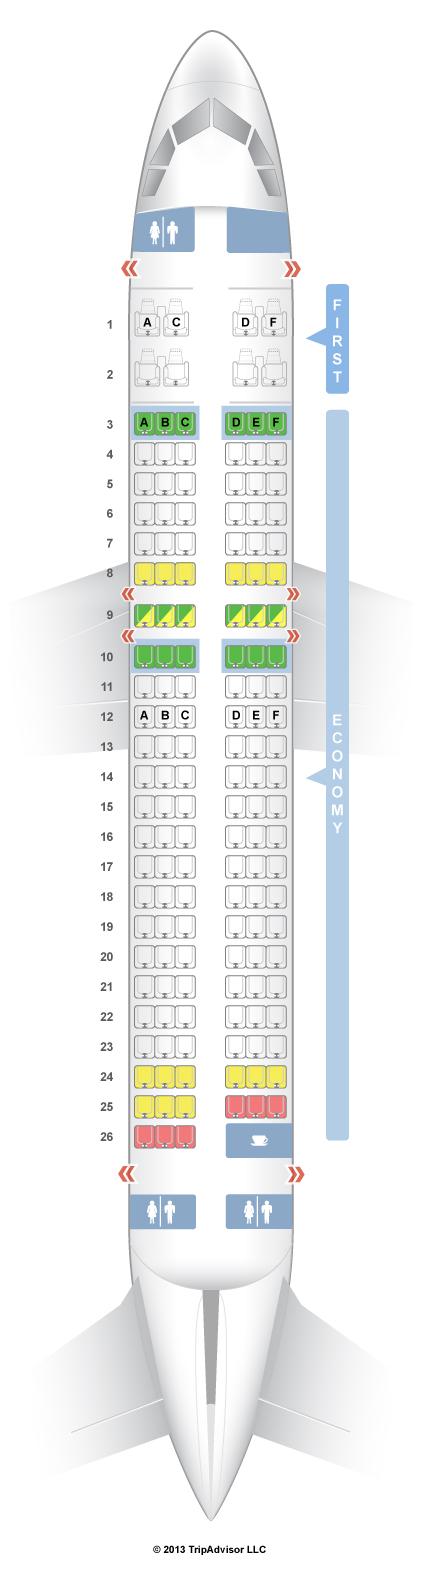 Short Haul British Airways A Seat Map Seat Get Free Images - Us airways seating map